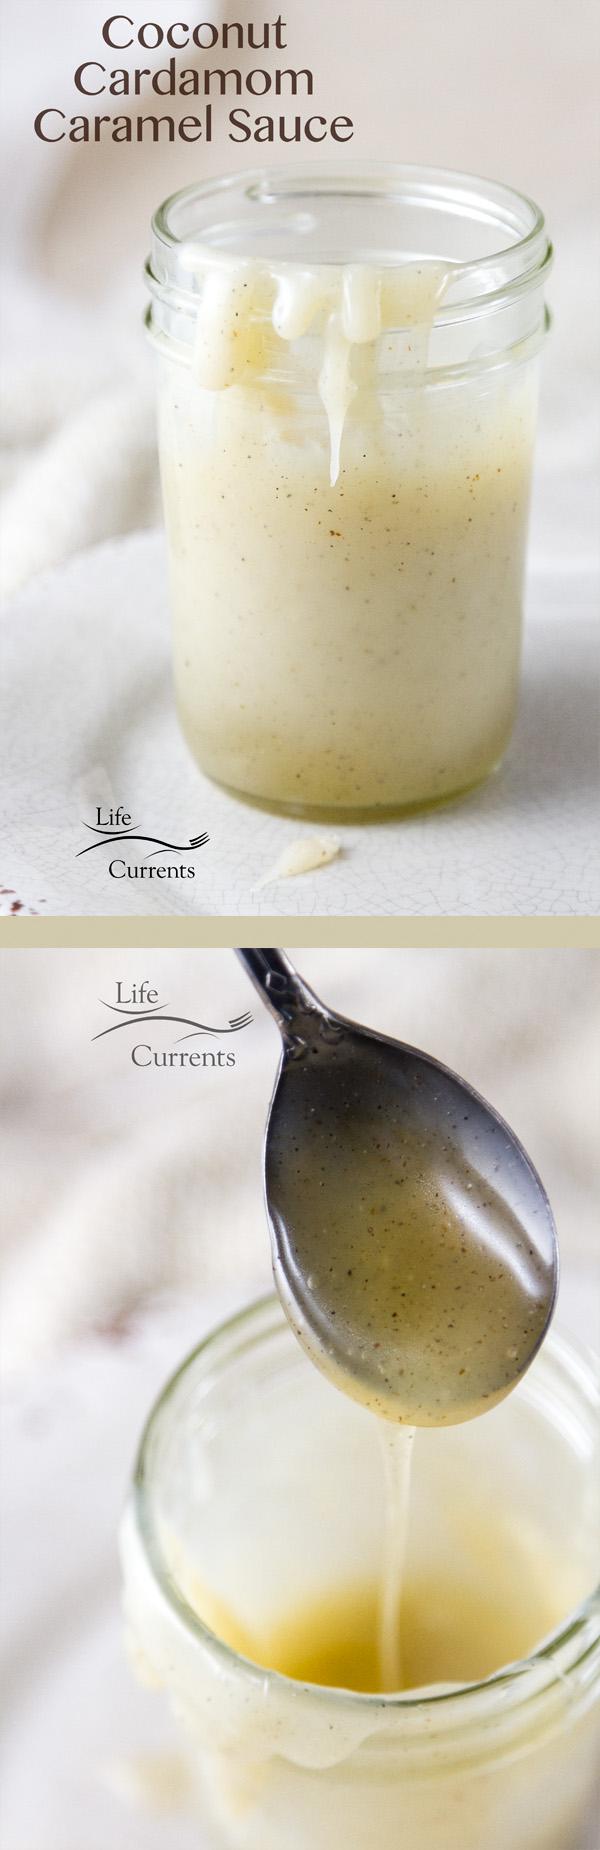 Coconut Cardamom Caramel Sauce - easy to make, and can be vegan #caramel #vegan #coconut #sauce